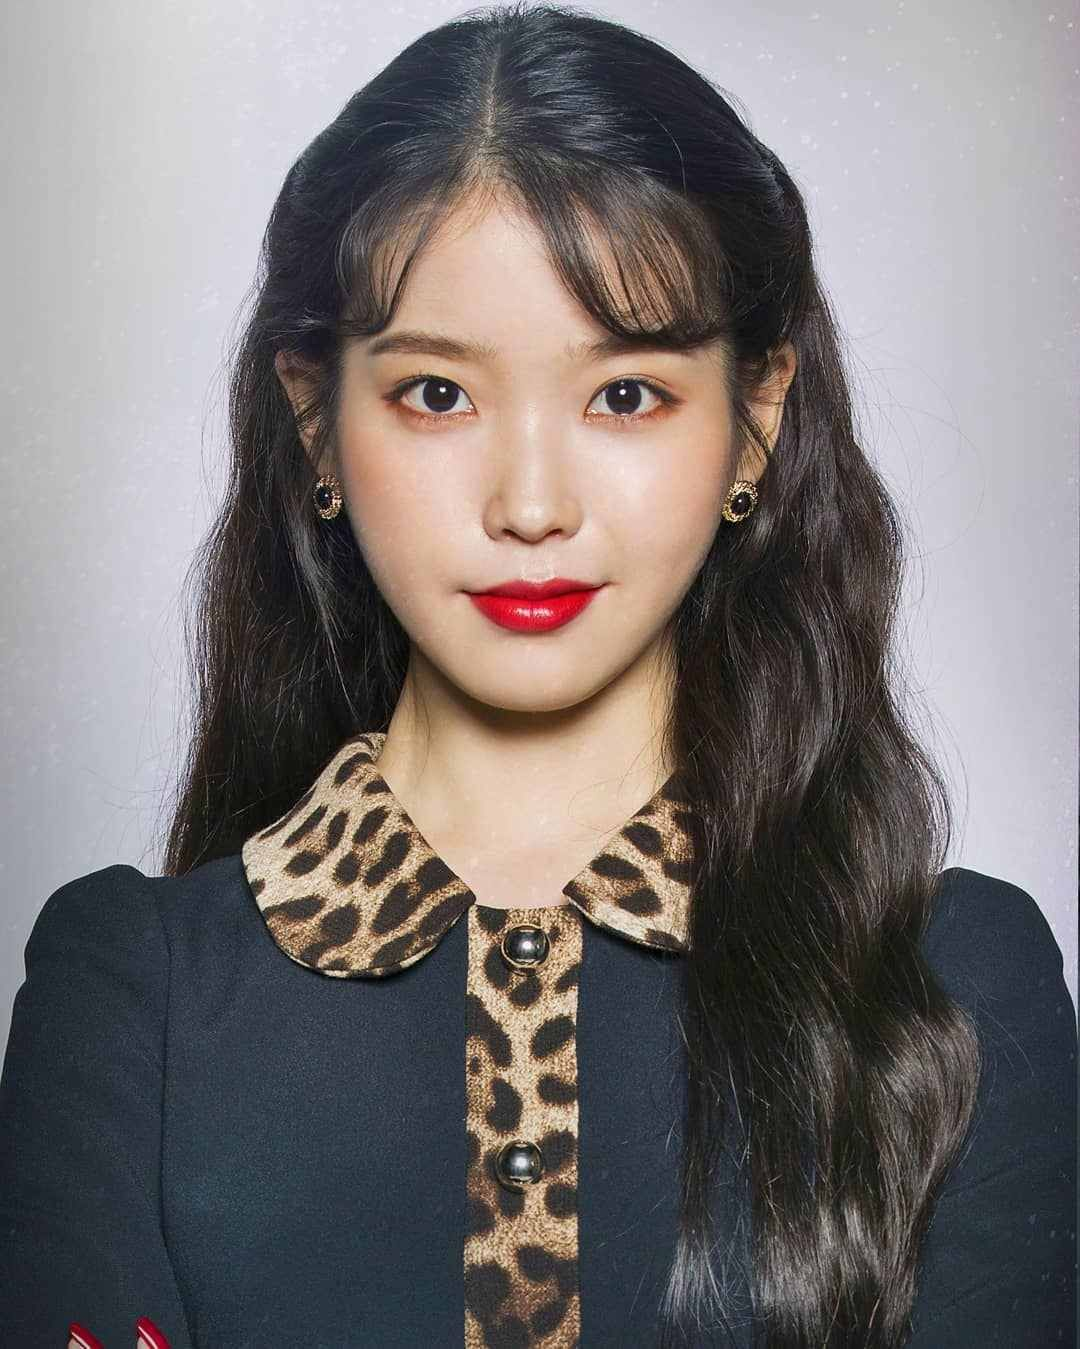 Inilah 10 Idol Kpop Yang Ternyata Hampir Debut Dengan Grup Lain Gaya Rambut Pendek Gaya Rambut Aktris